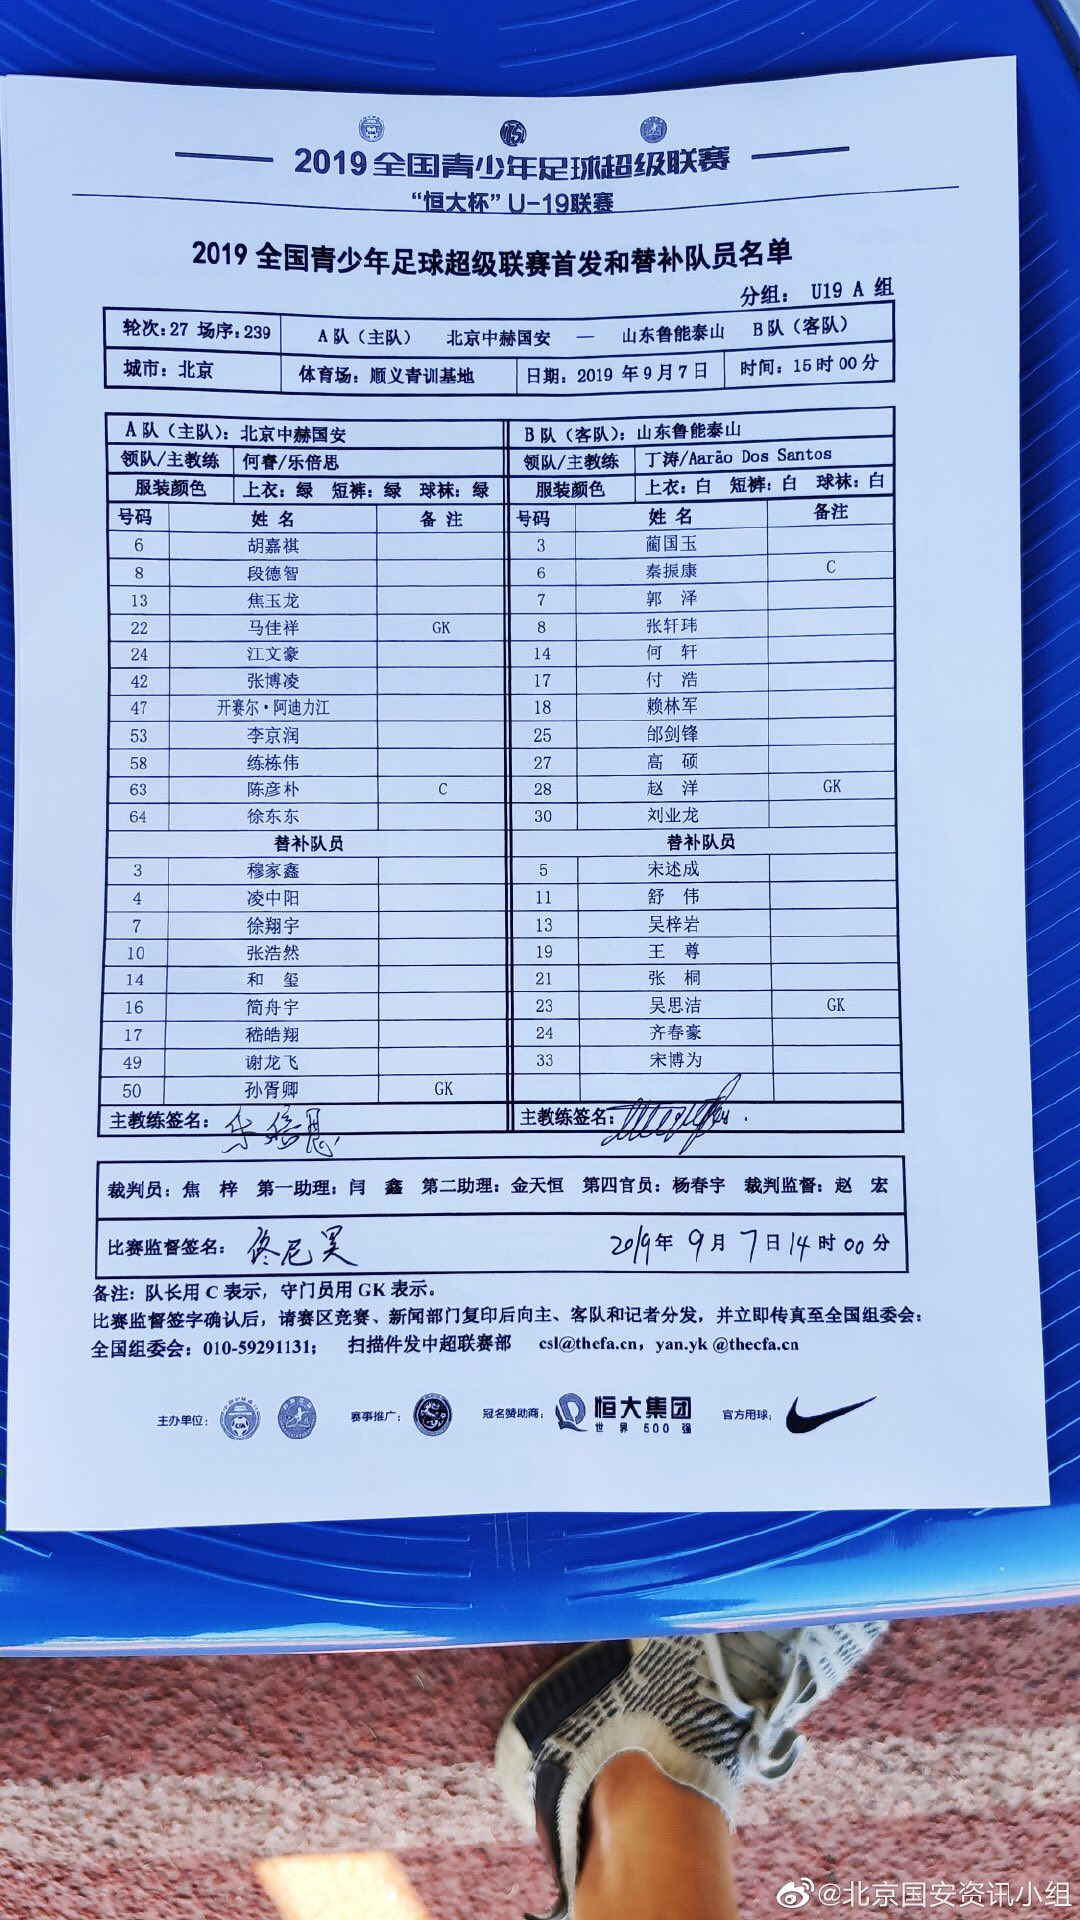 【U19A】北京中赫国安 vs 山东鲁能泰山:首...